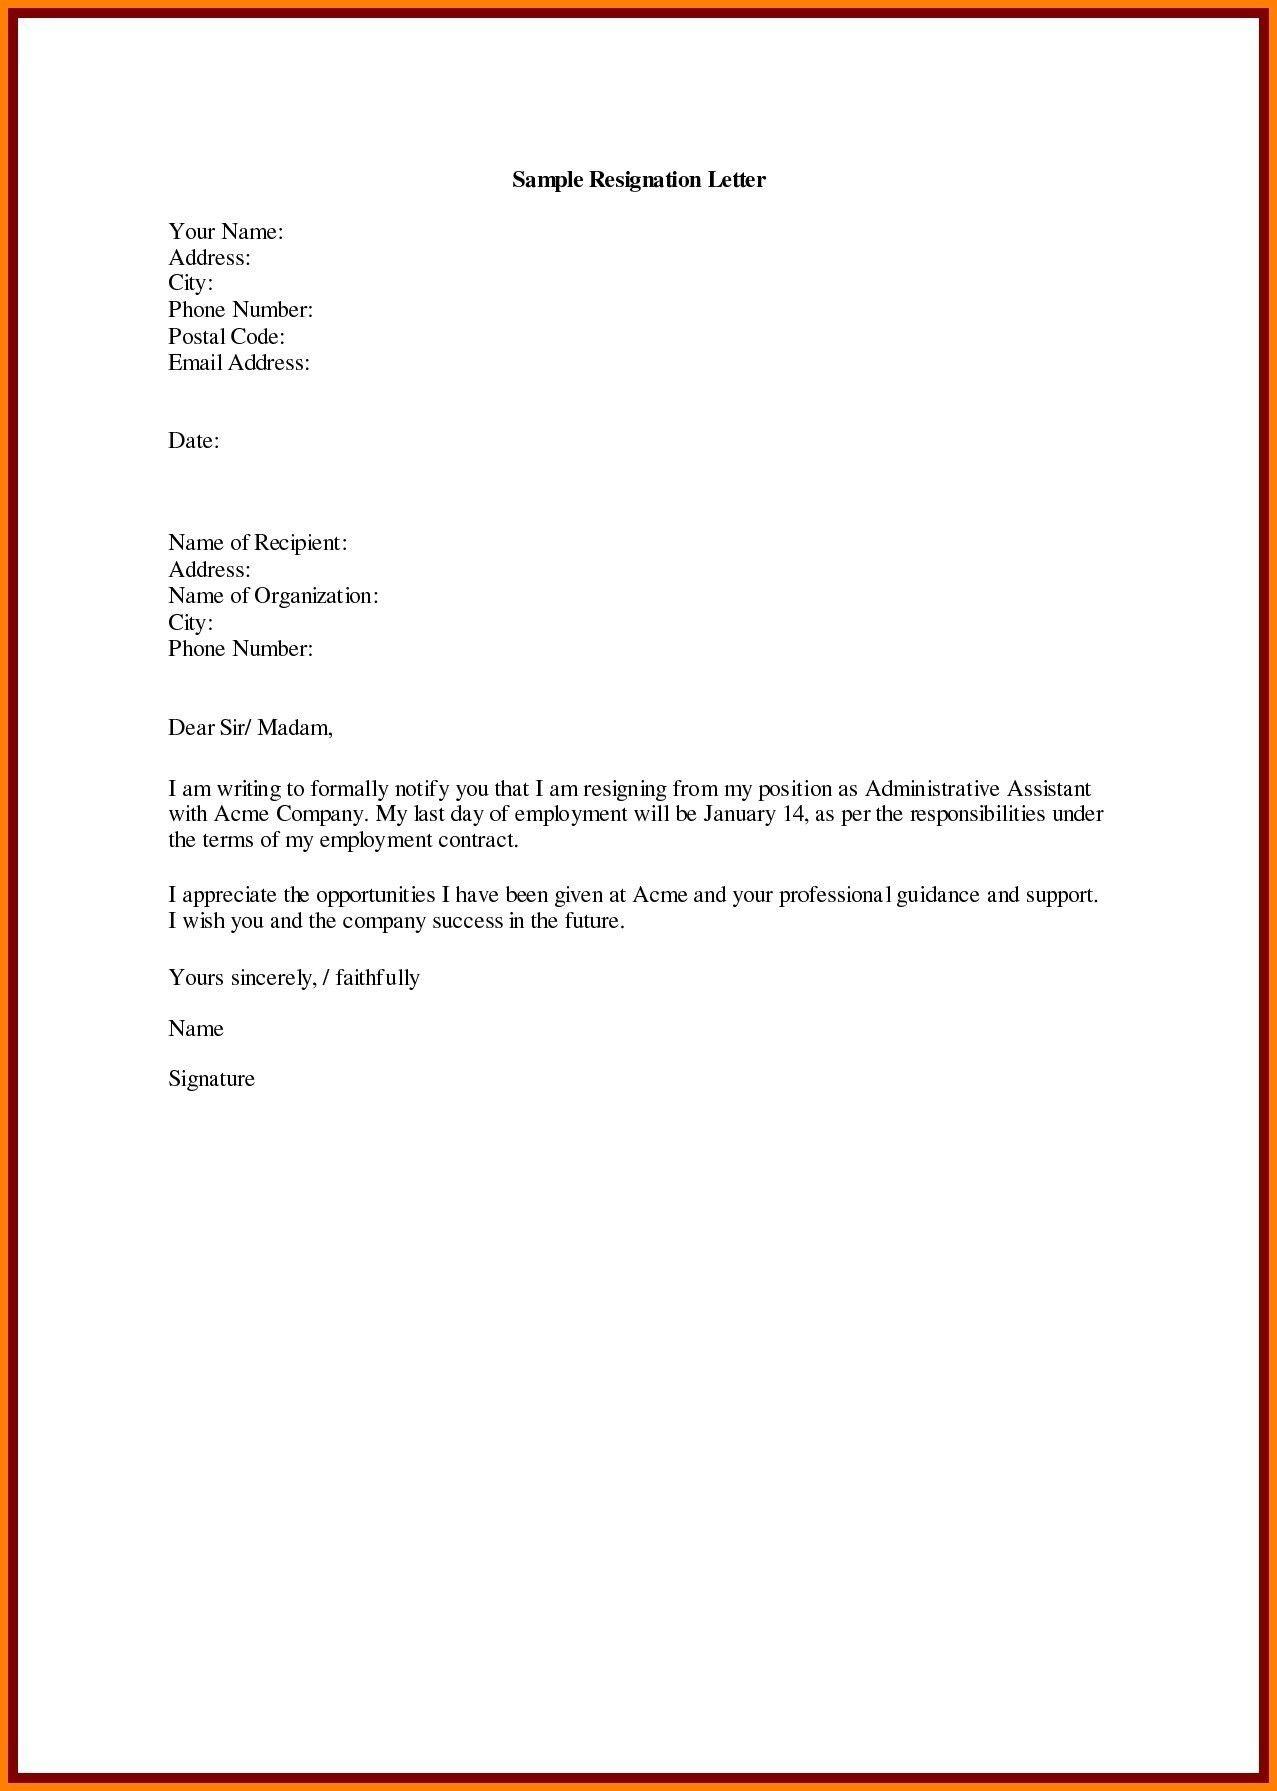 job regine letter